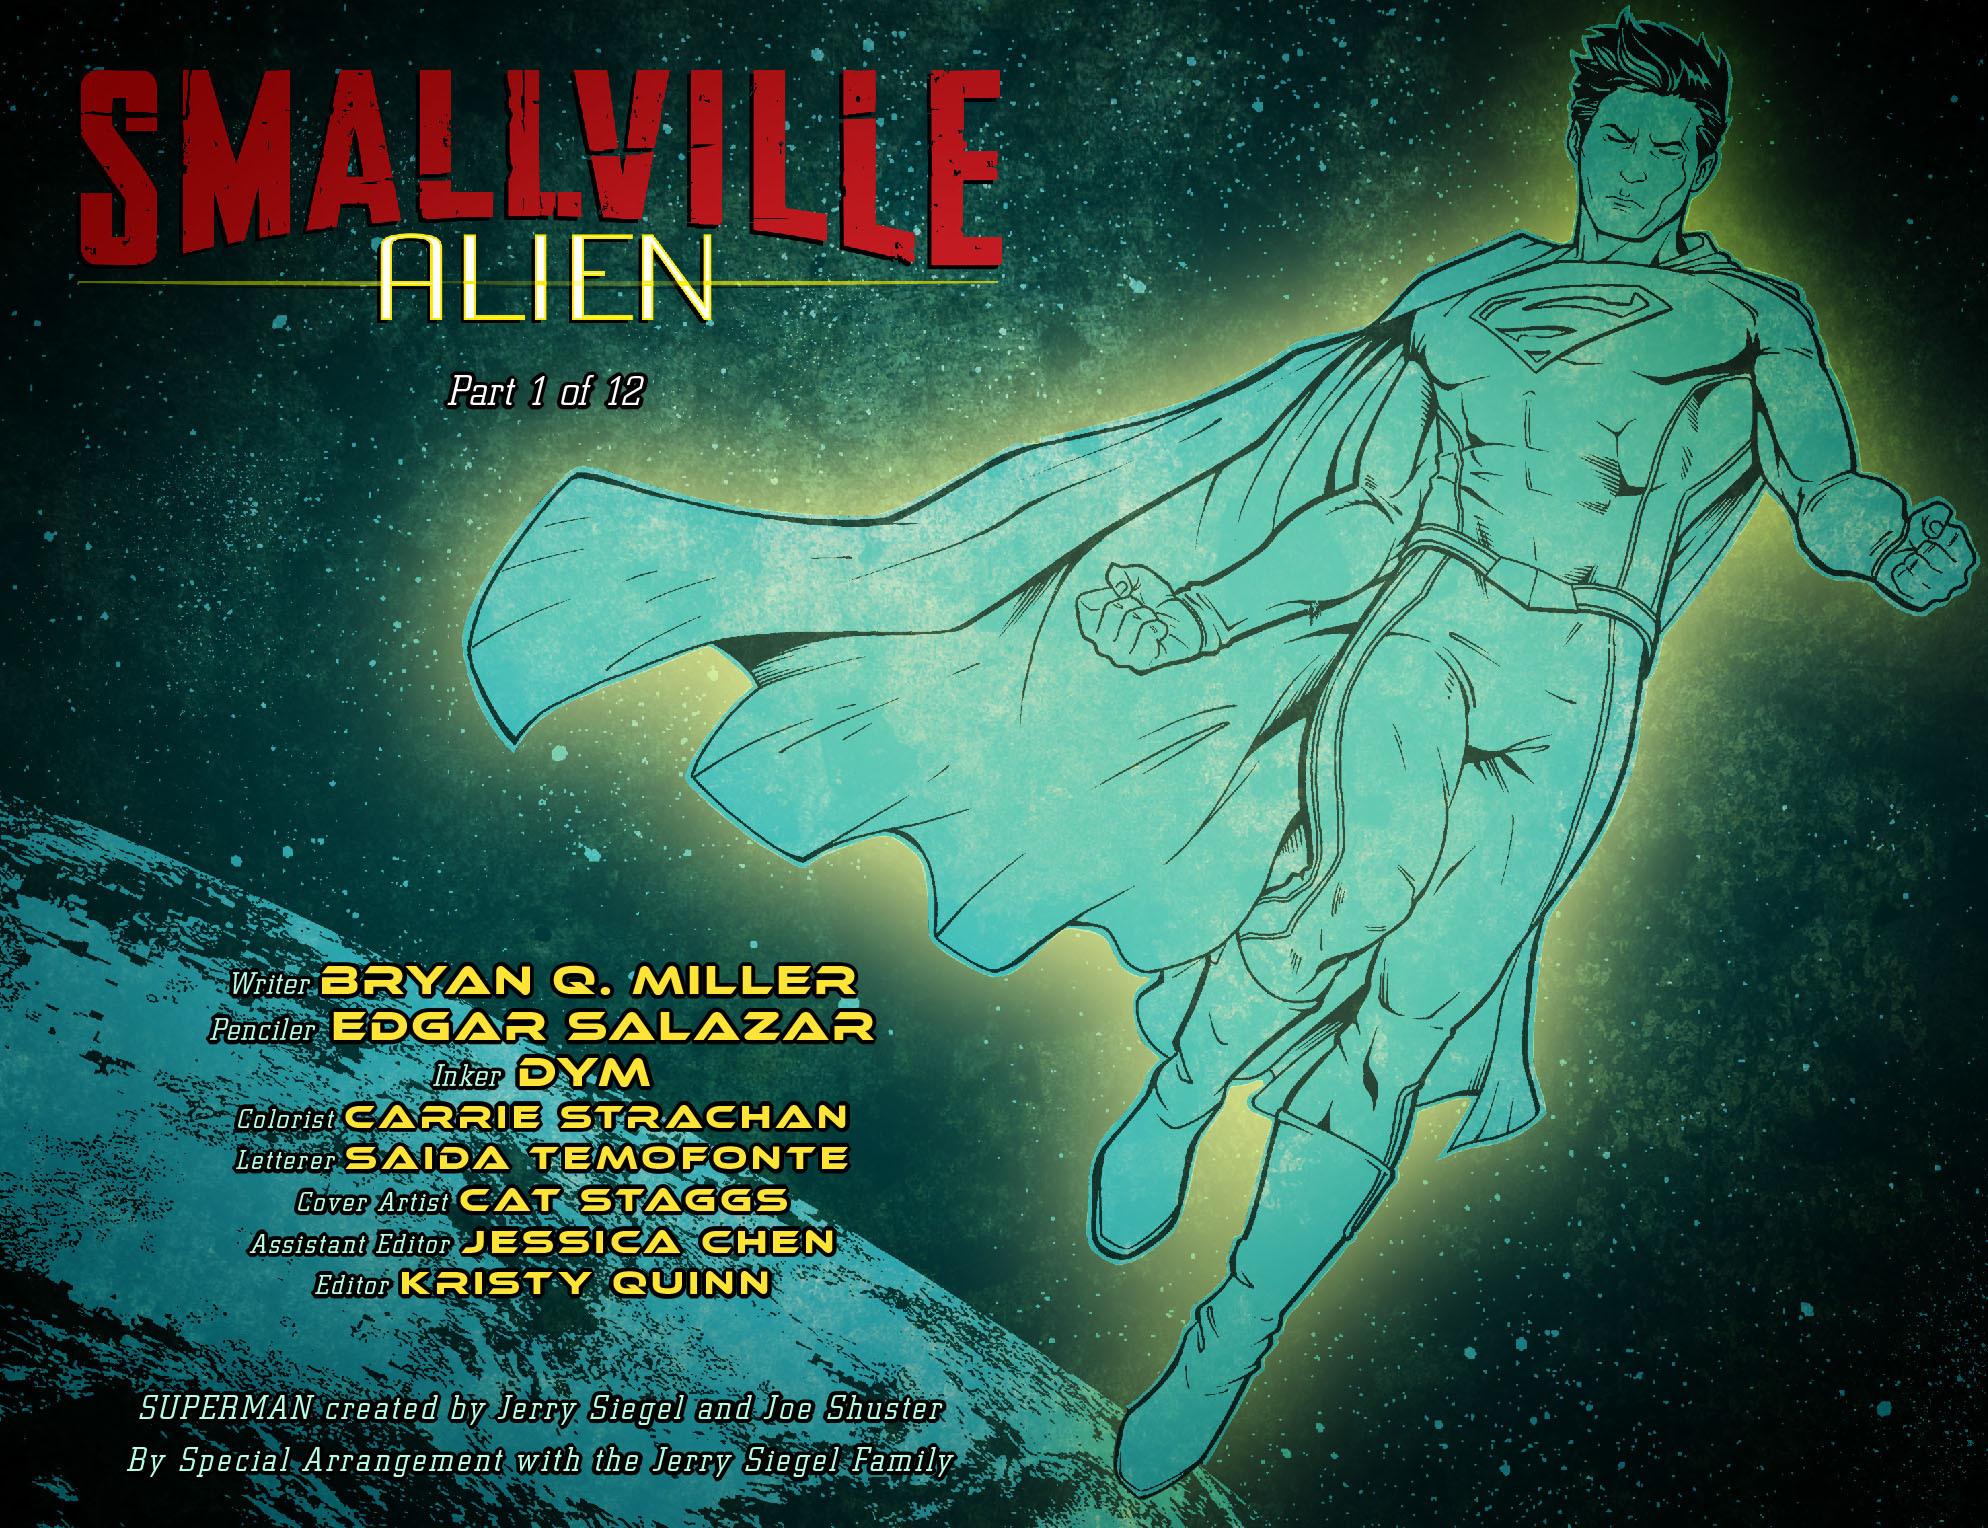 Read online Smallville: Alien comic -  Issue #1 - 2